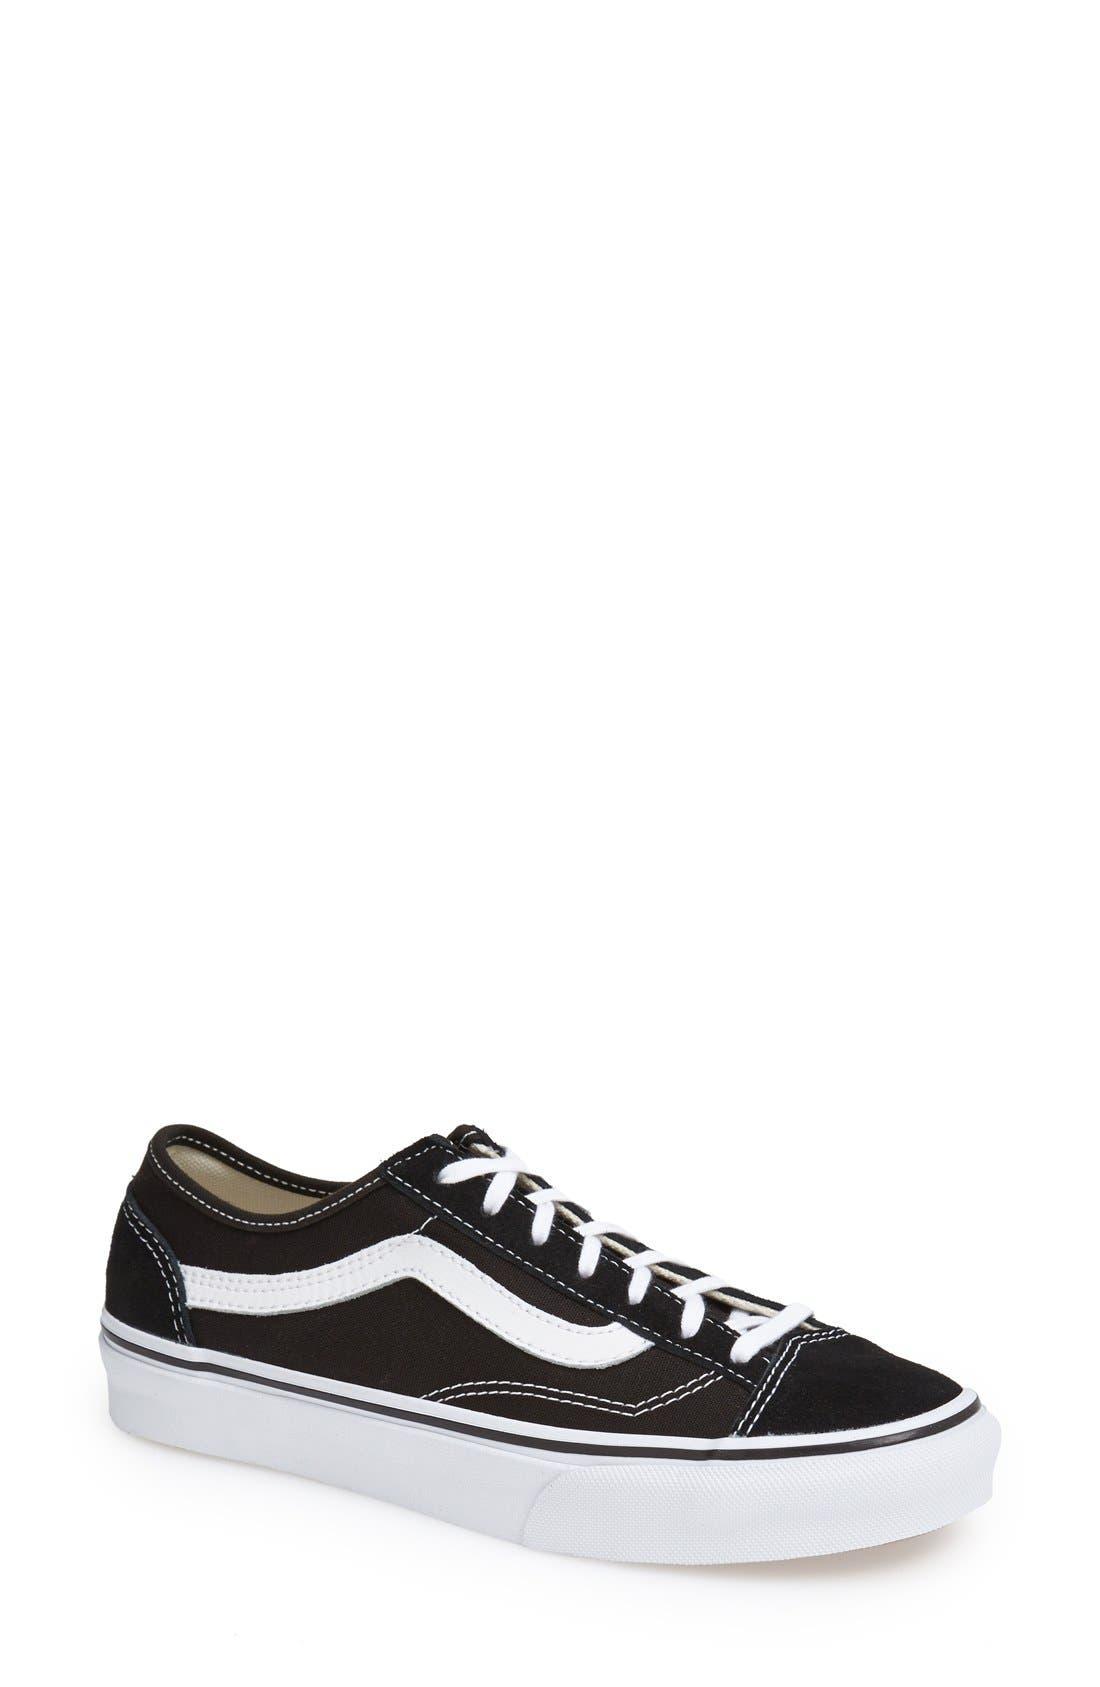 Alternate Image 1 Selected - Vans 'Style 36' Sneaker (Women)